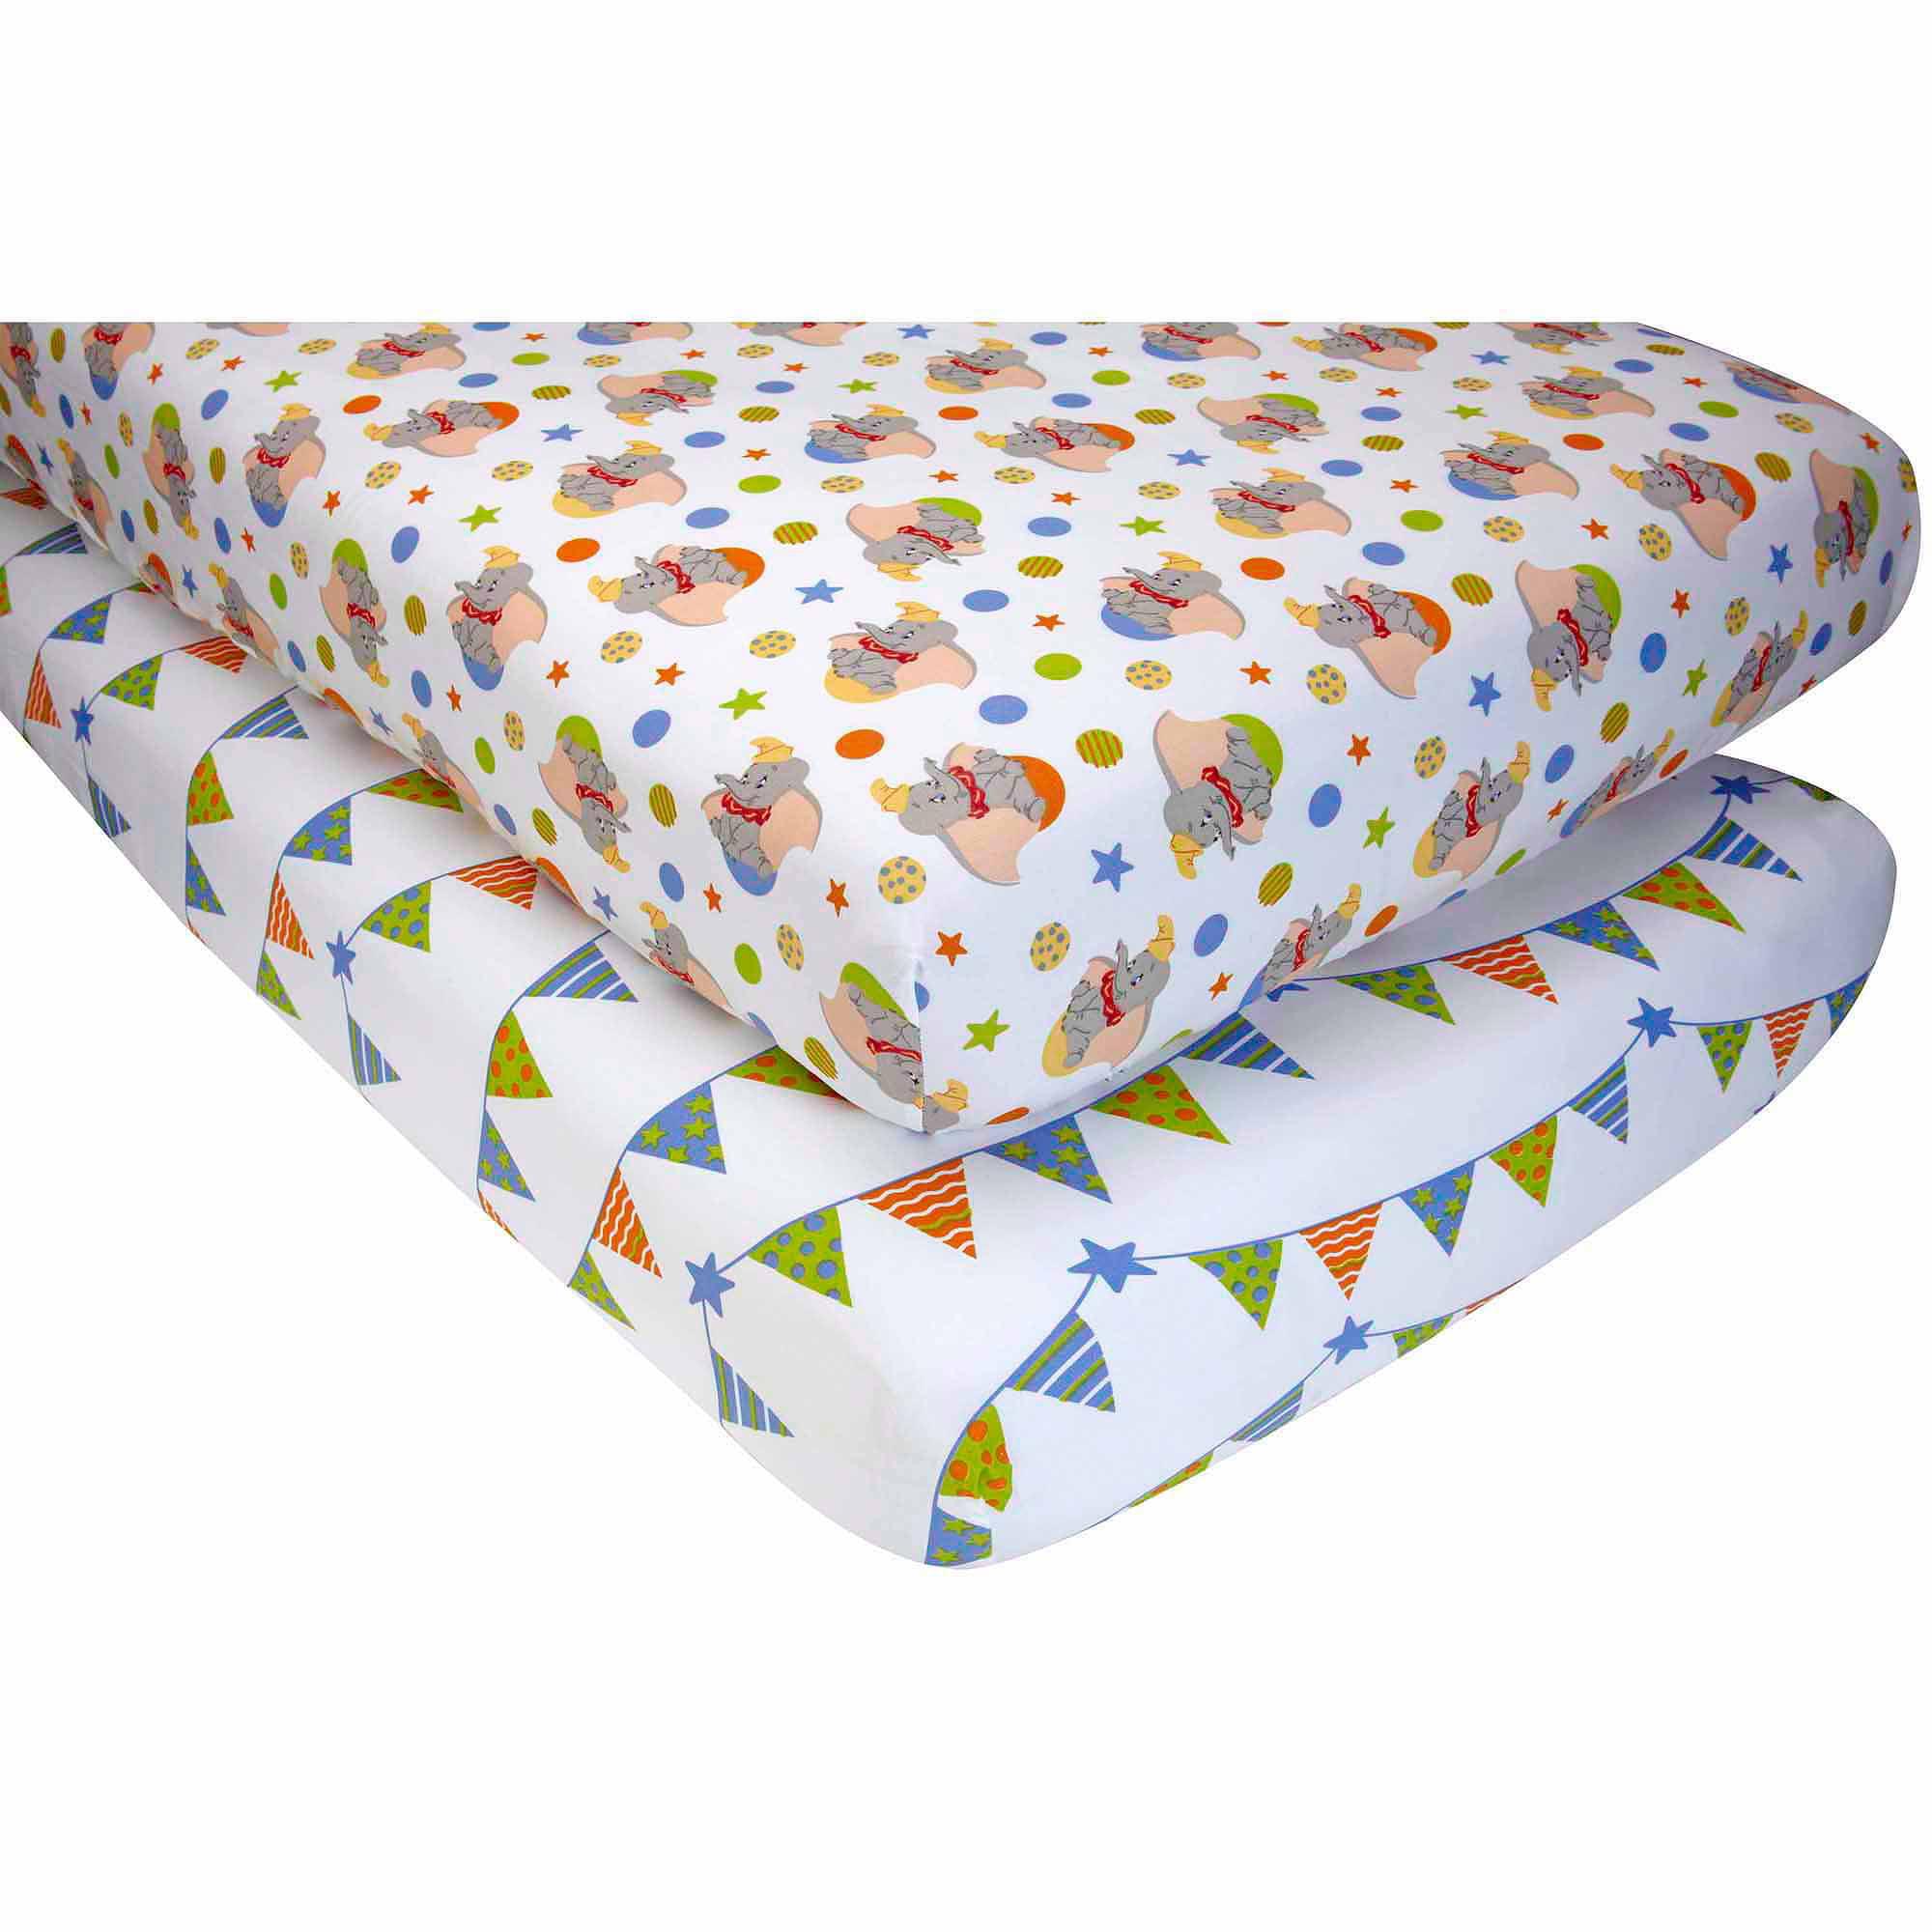 Disney Baby Bedding Dumbo Set of 2 Crib Sheets